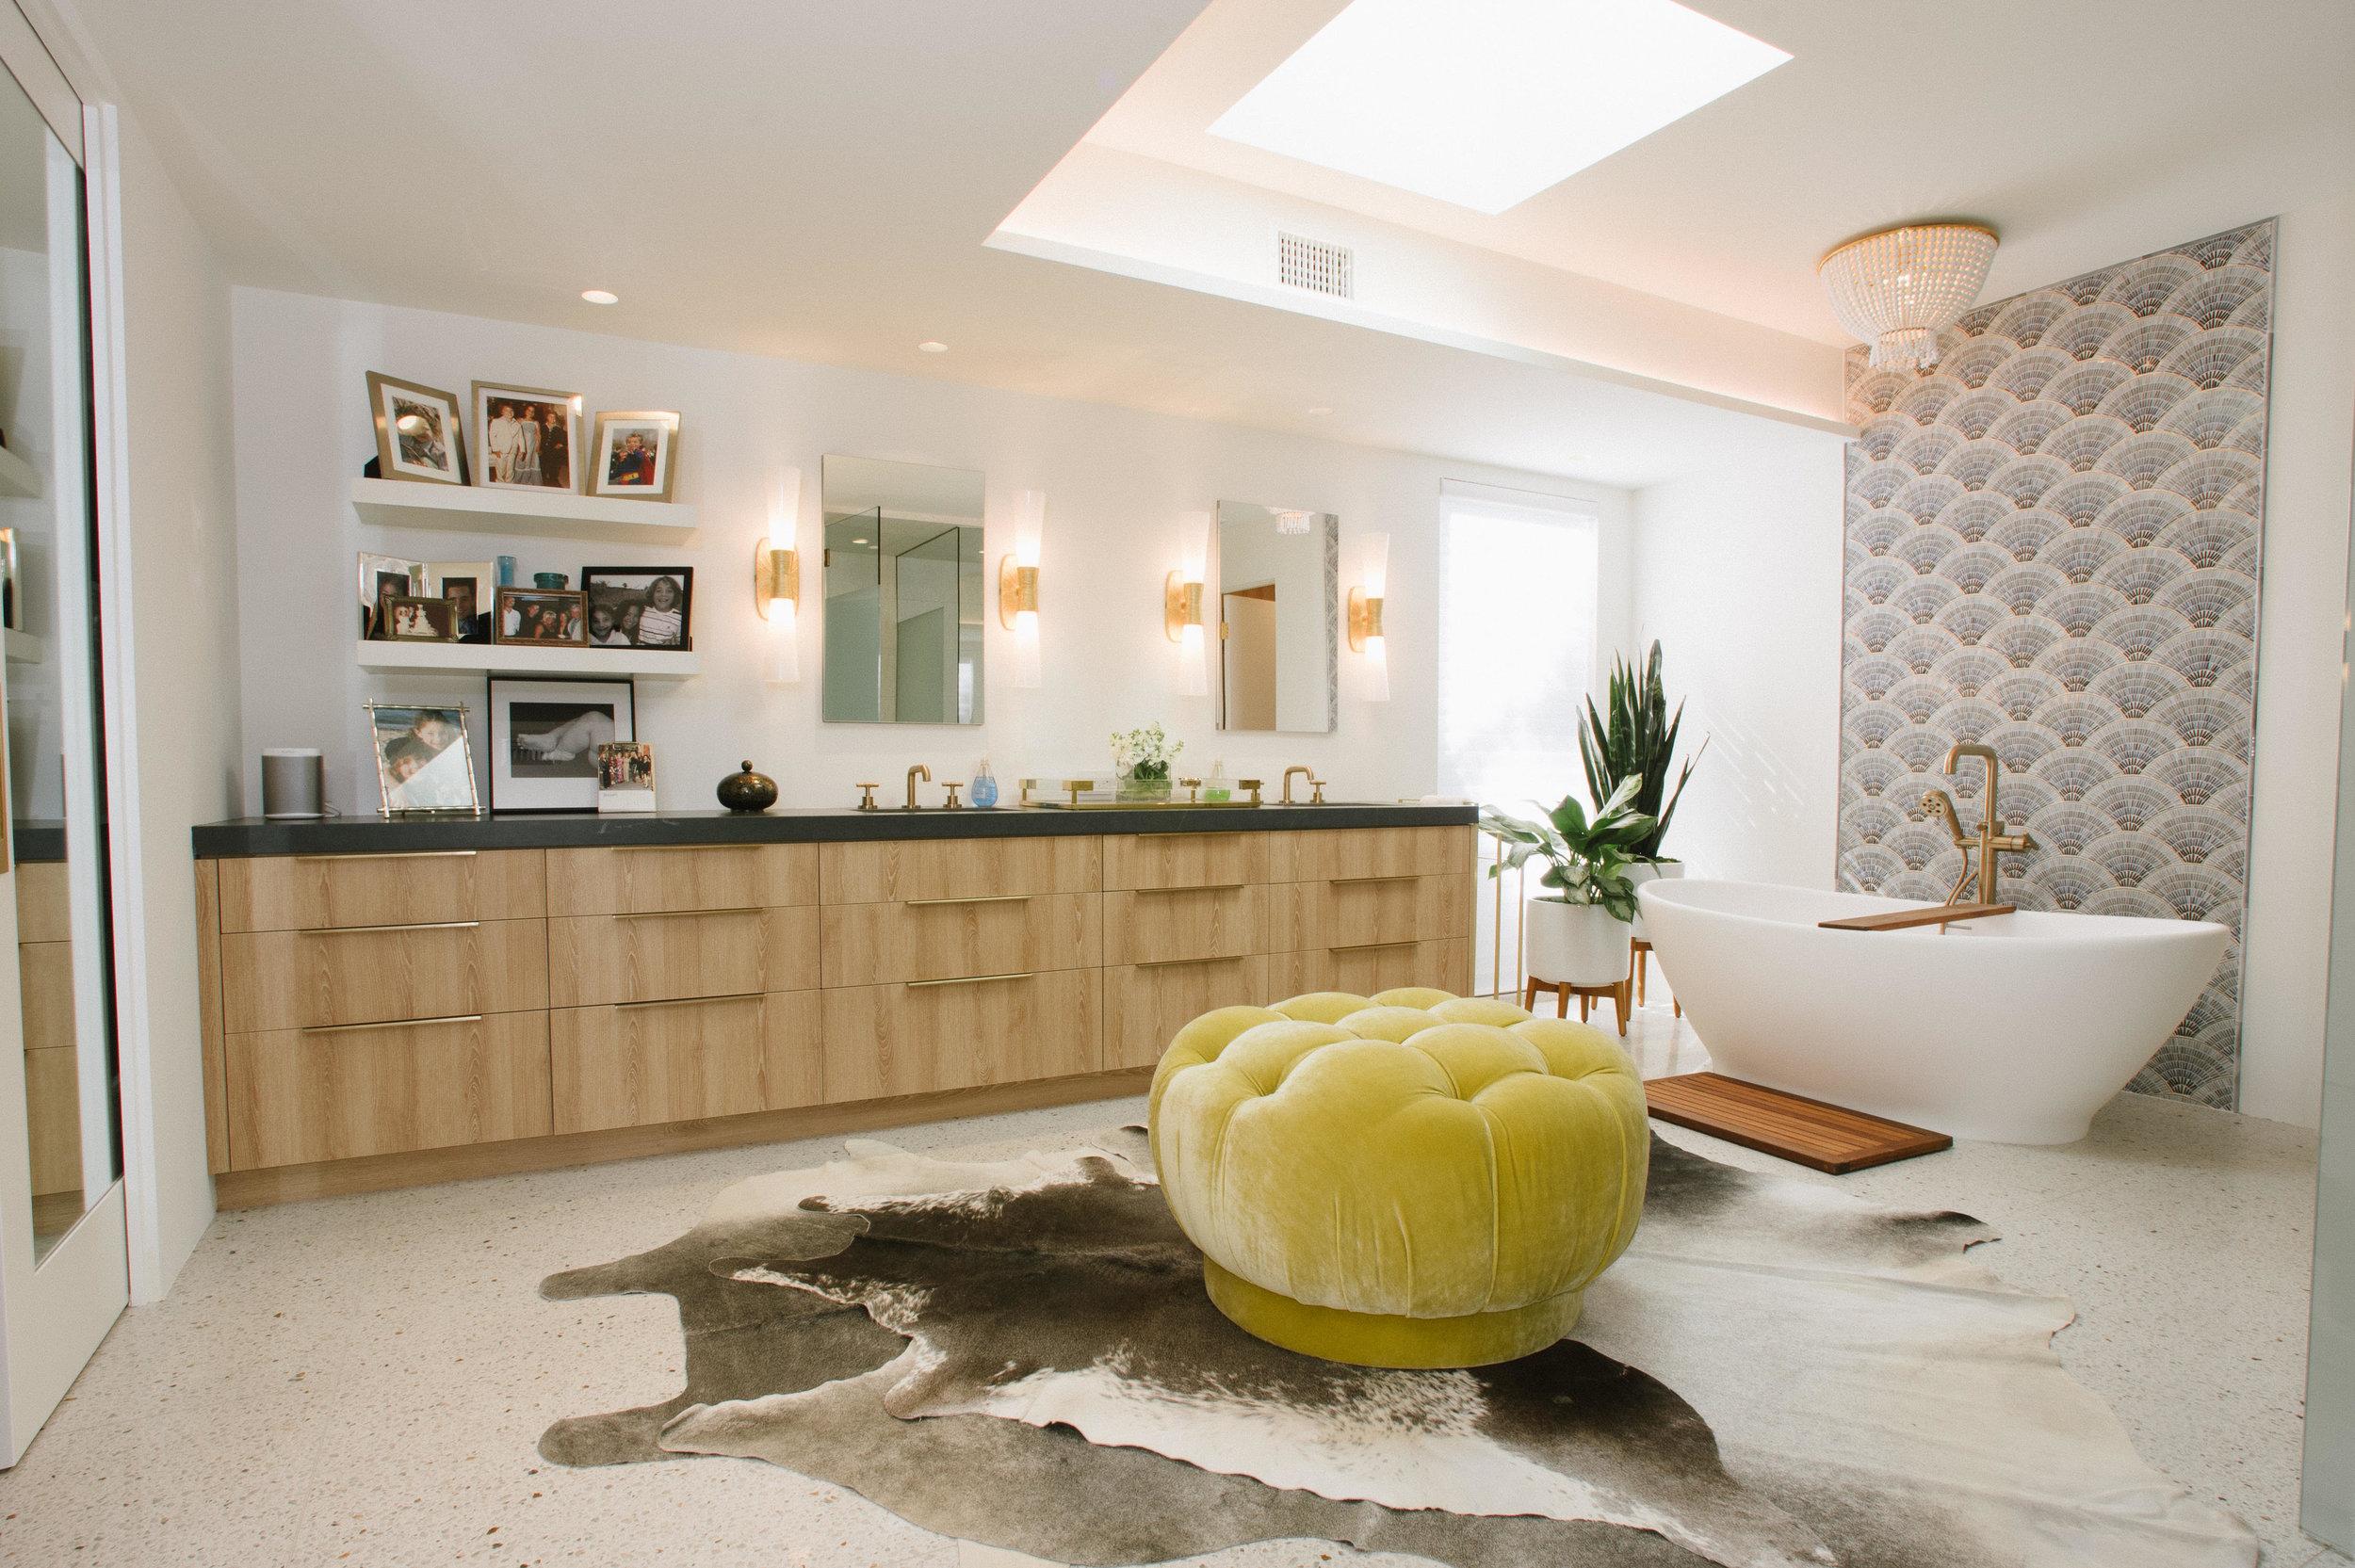 Staci-Munic-Interiors-midcentury-master-bath-suite-Palm-Springs.jpg